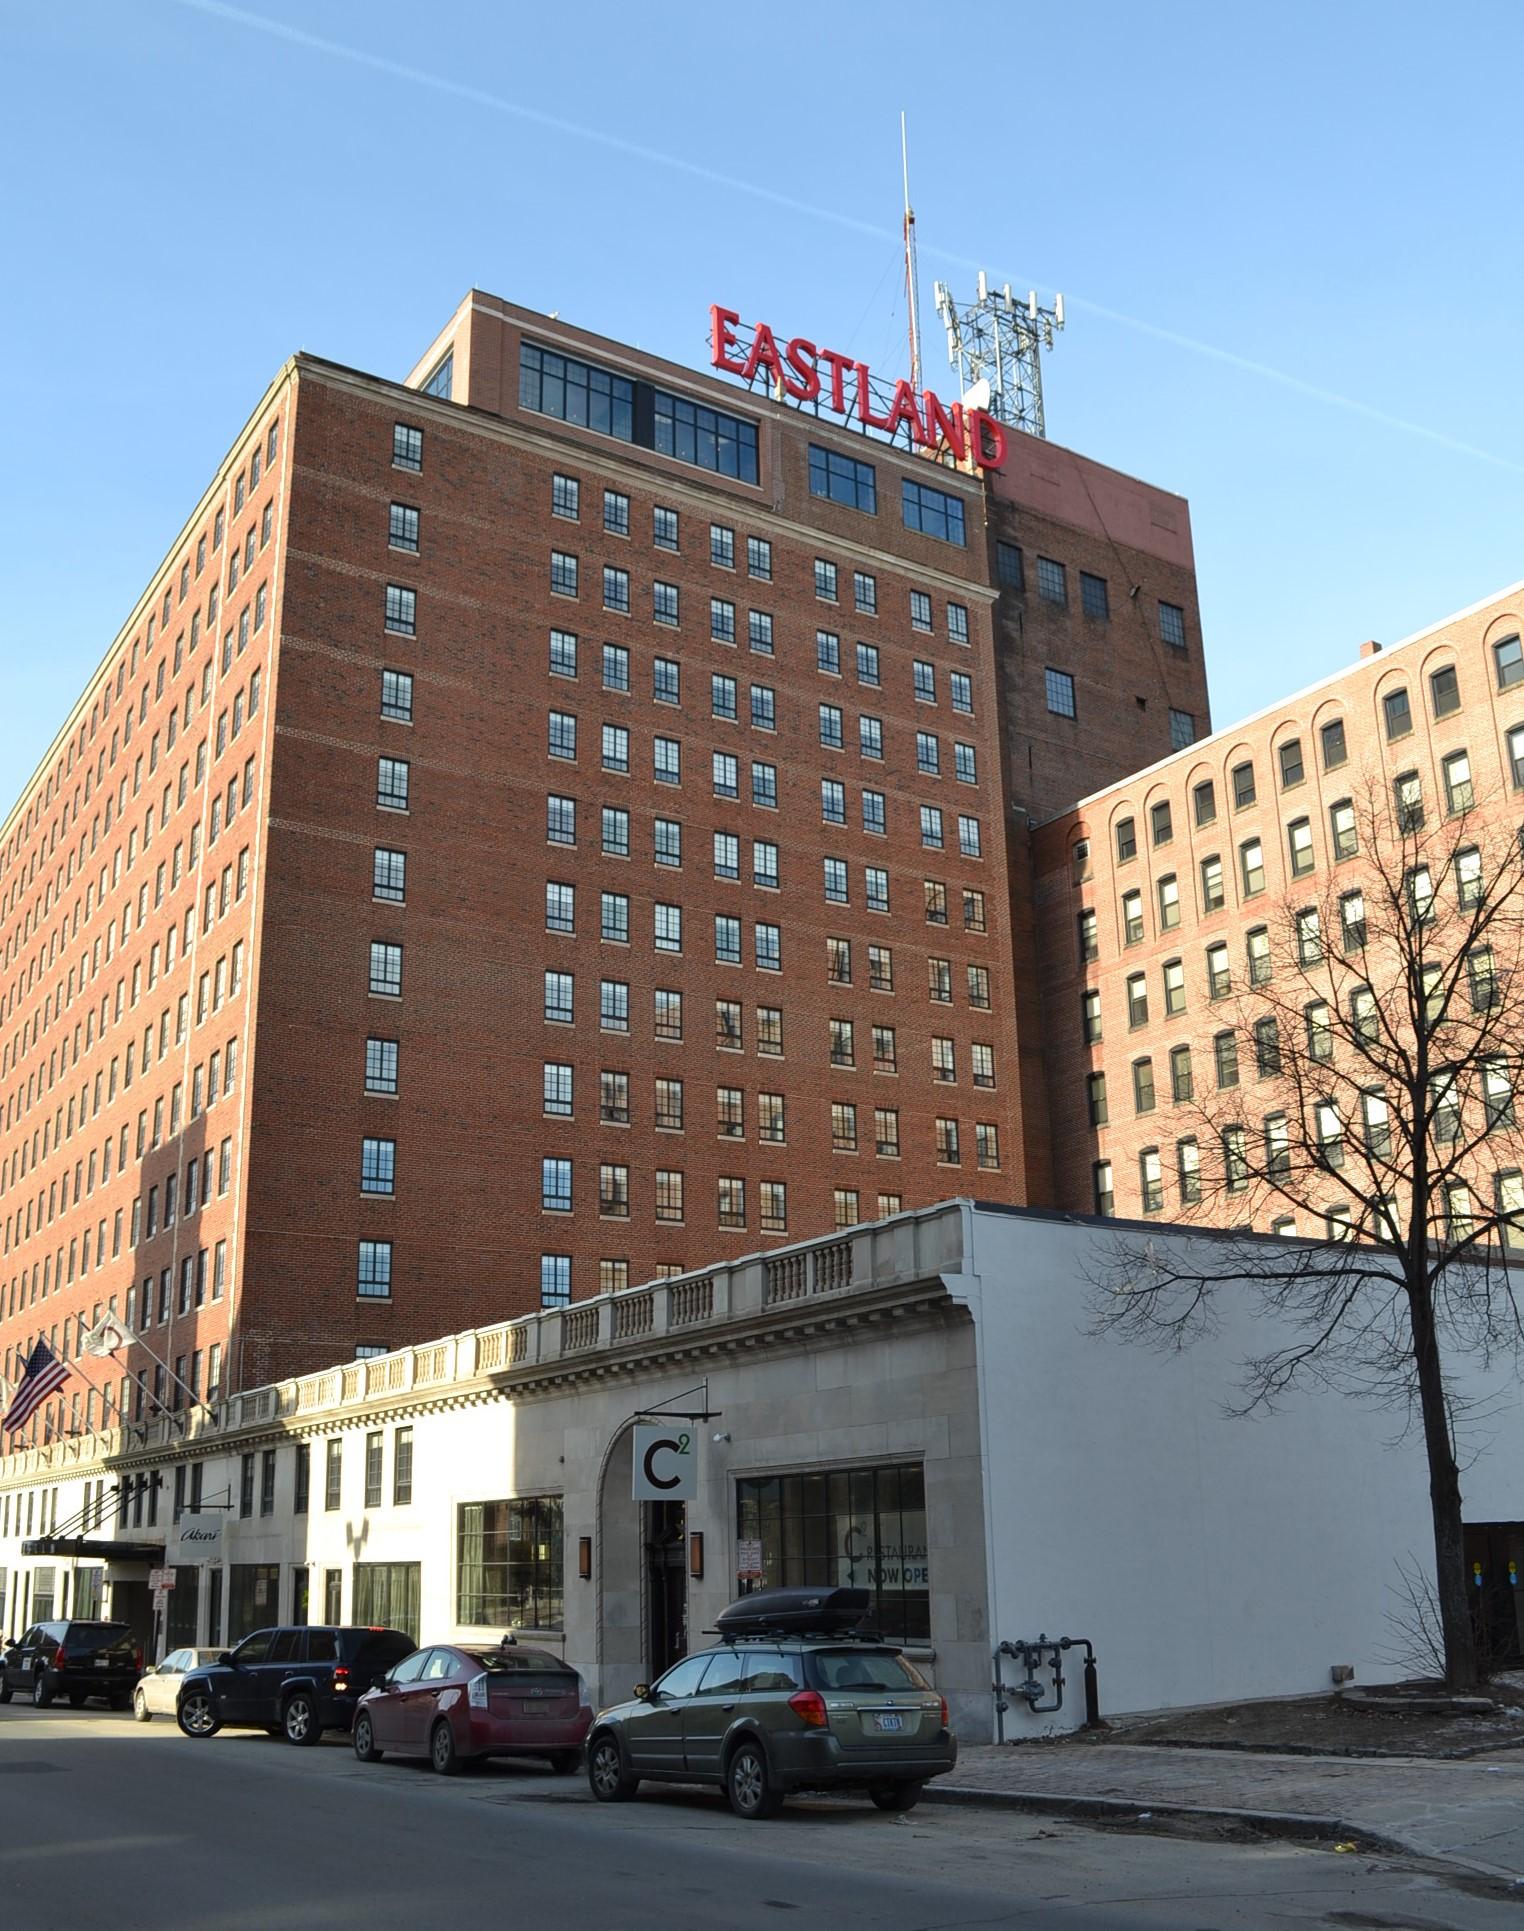 Eastland Park Hotel - Portland, ME HospitalityClient: Rockbridge CapitalBuilt: 1927Project Costs: $50.5 millionHTC equity: Over $7.3 million